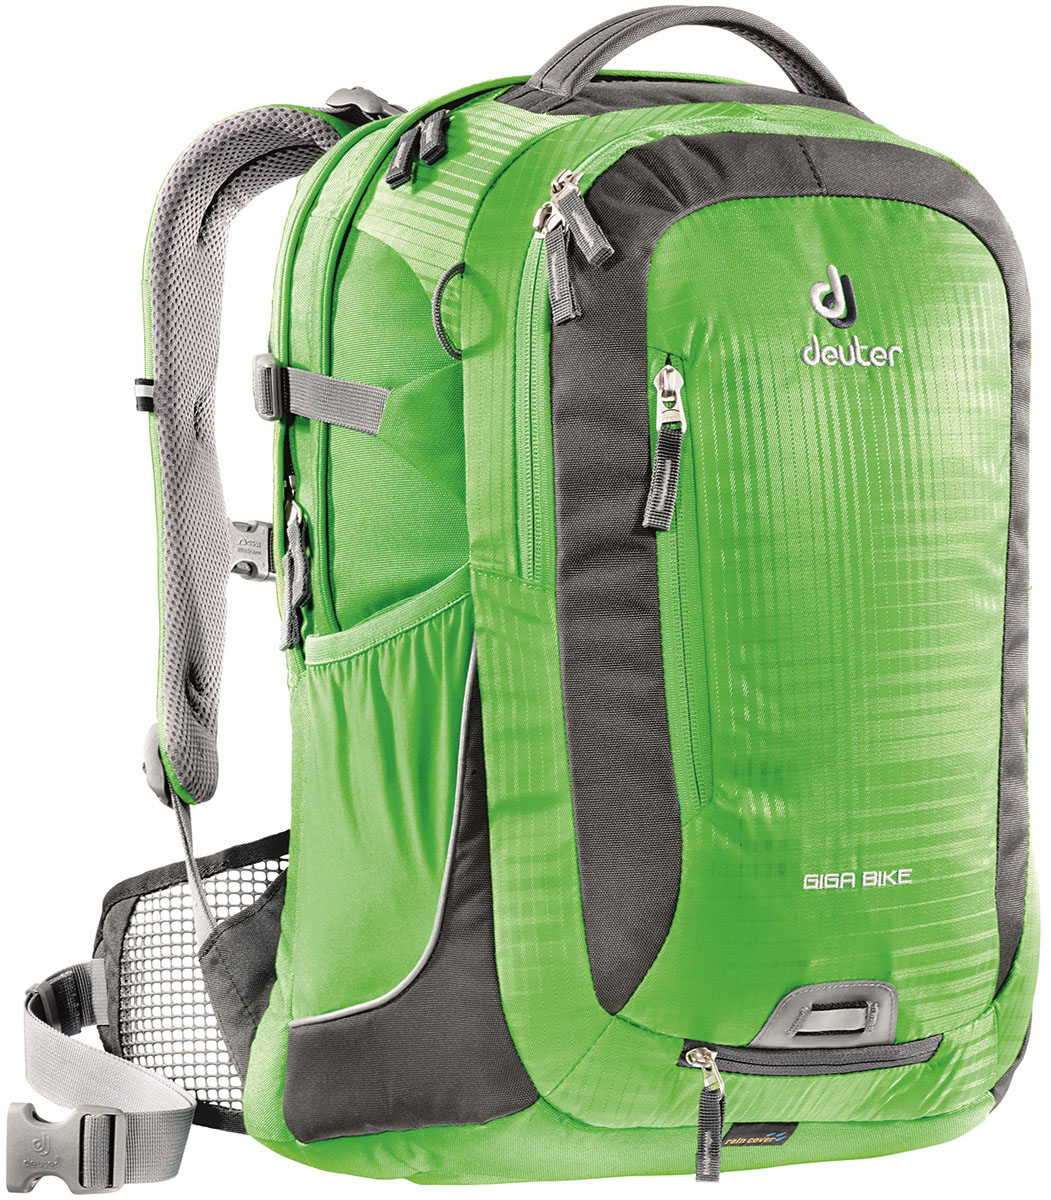 Рюкзак Deuter Giga Bike, цвет: зеленый, 28 л рюкзак deuter daypacks giga цвет черный 28л